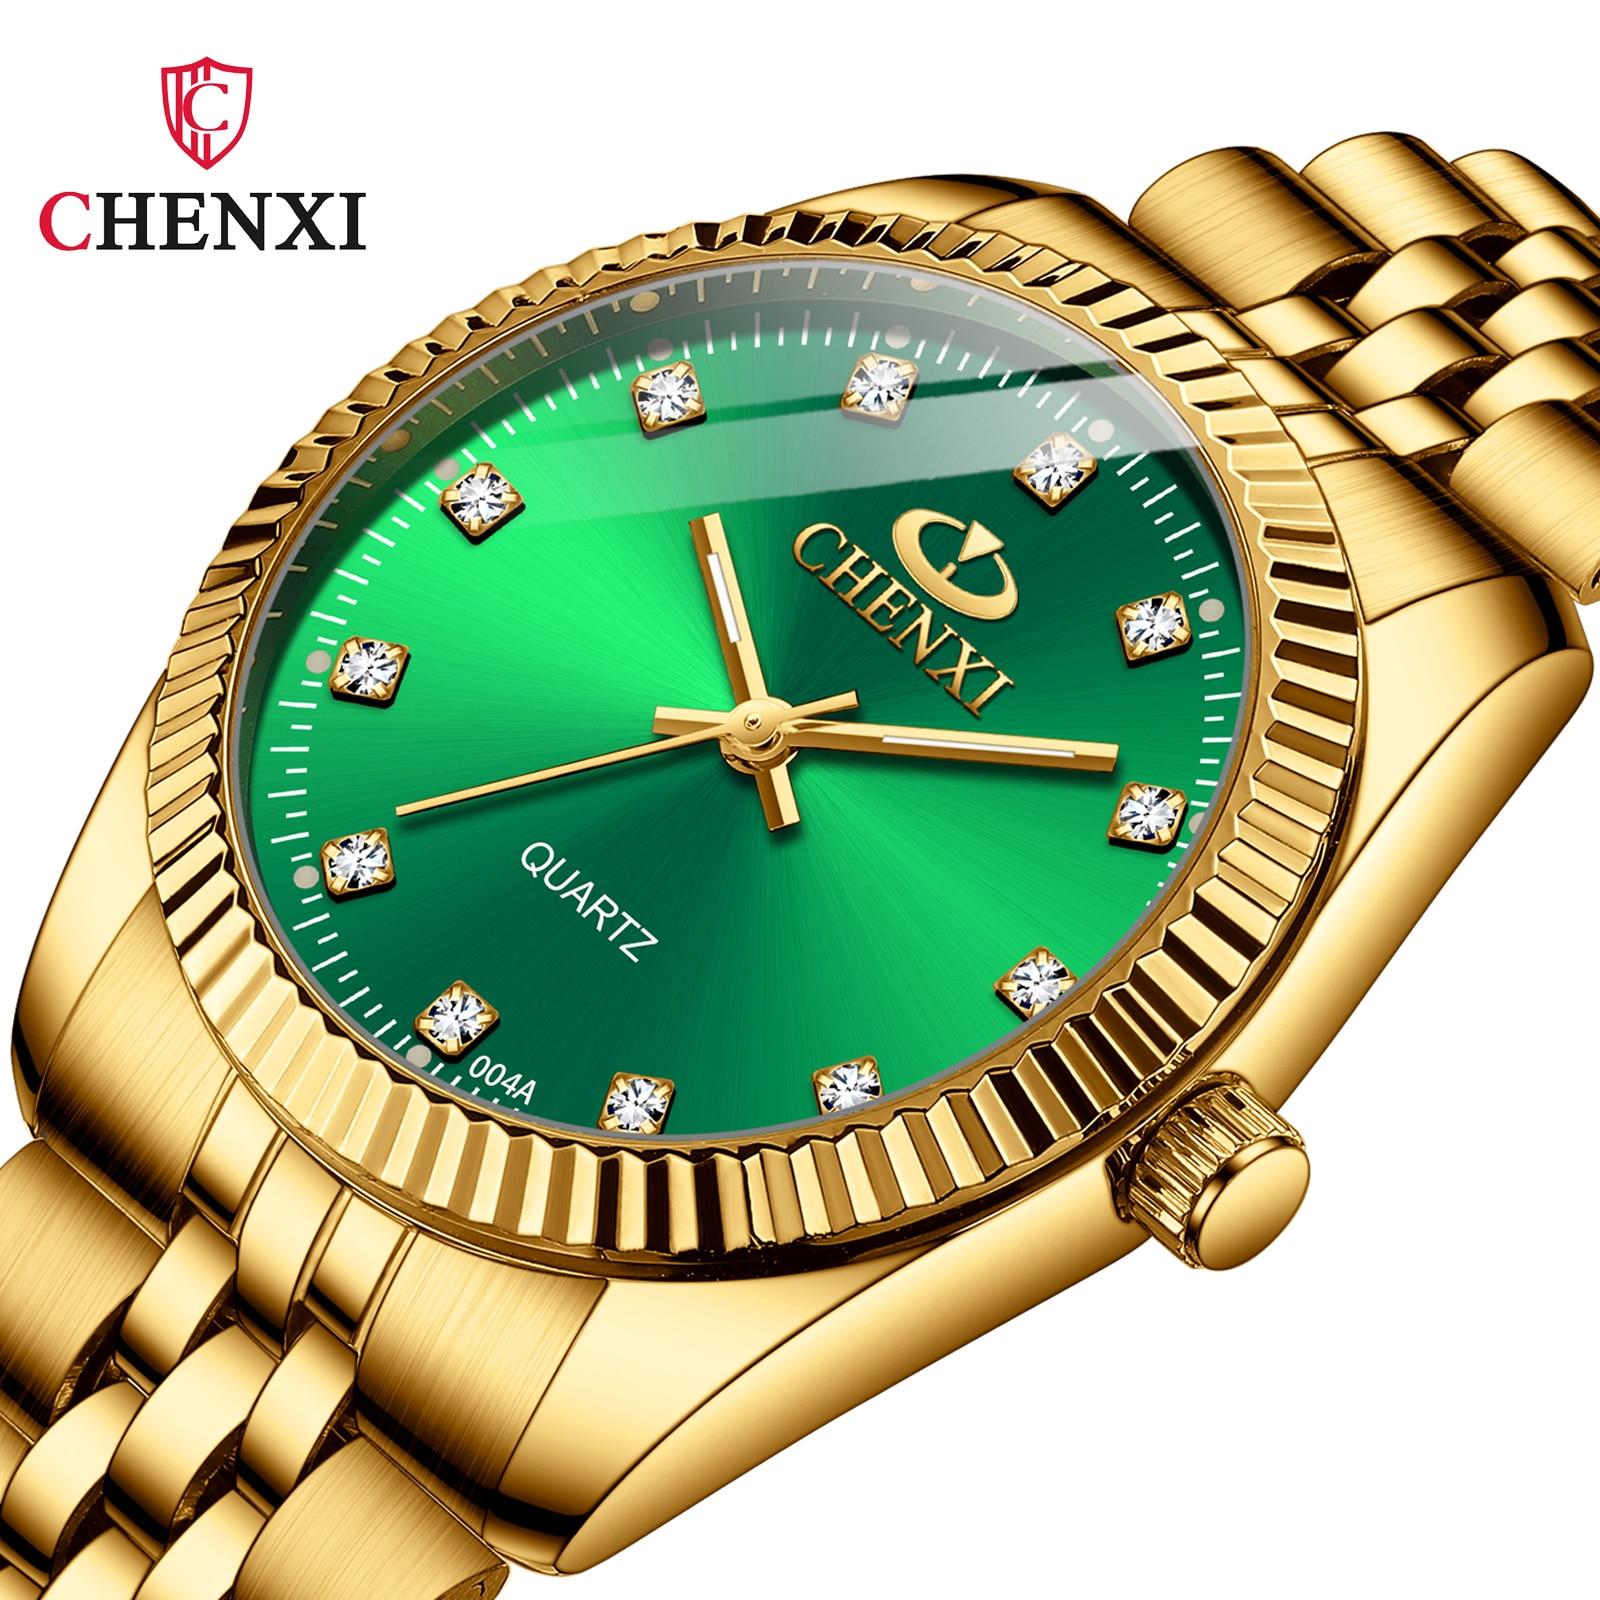 CHENXI Men Gold Watch Male Stainless Steel Quartz Golden men's Wristwatches for Man Top Brand Luxury